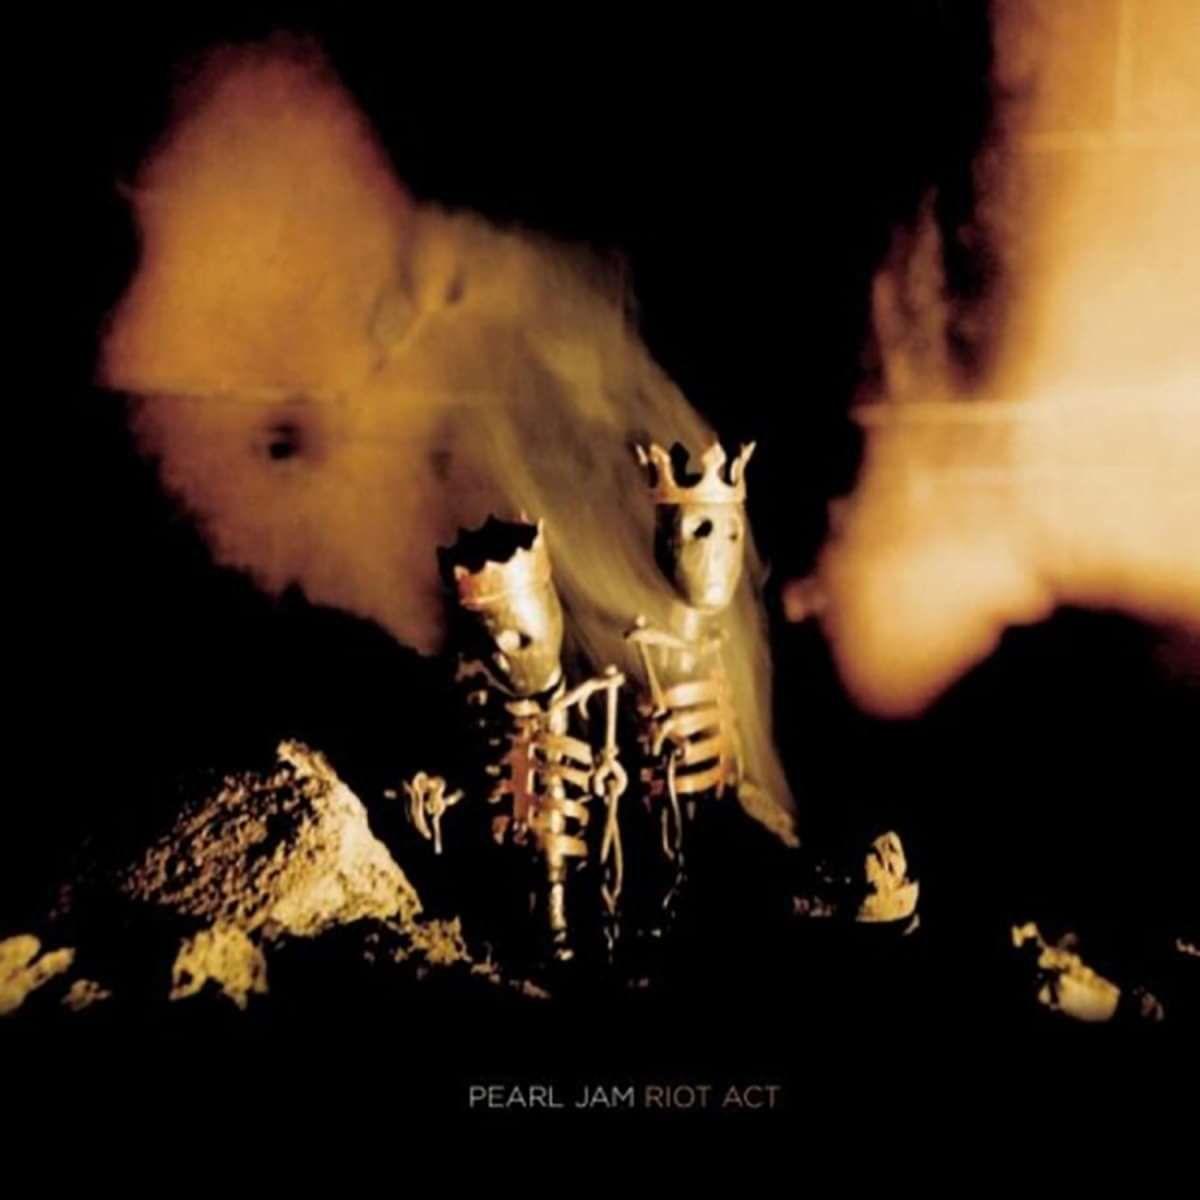 Riot Act – Double Vinyl - Pearl Jam